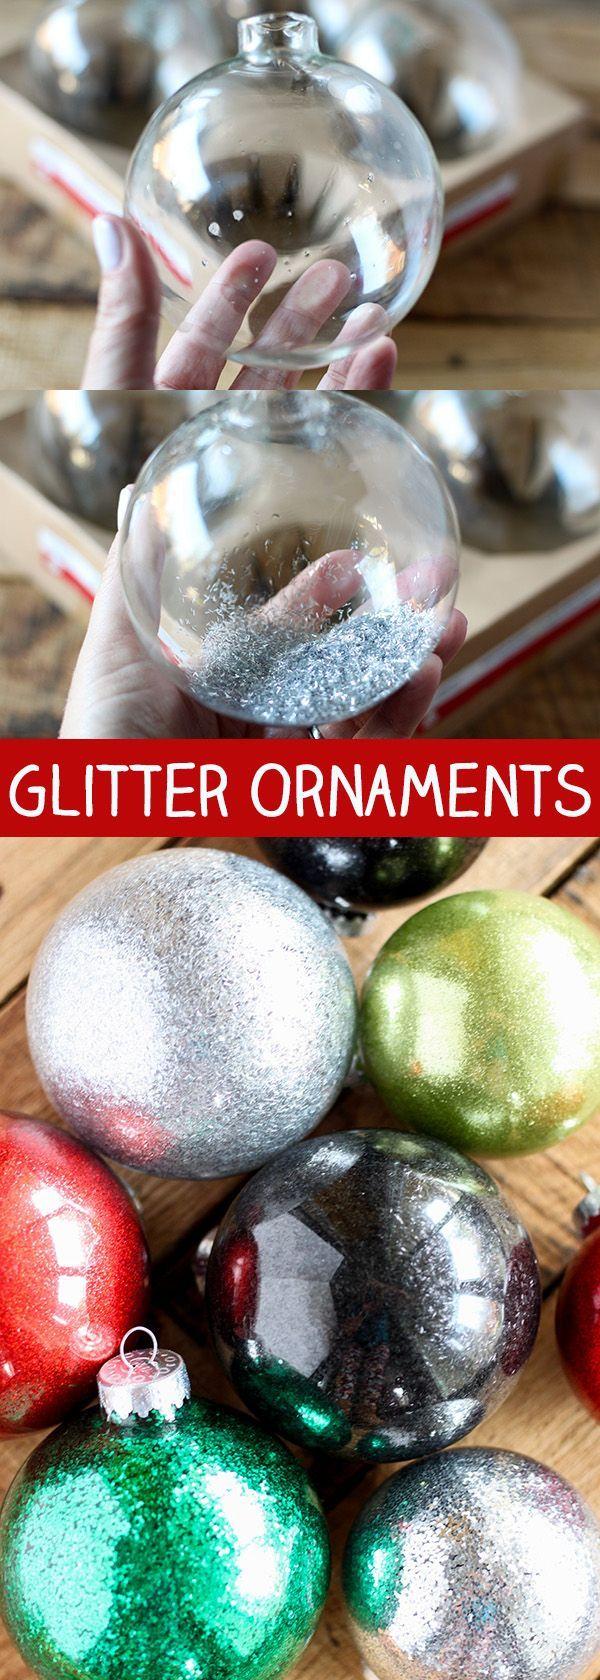 DIY Glitter Ornaments for Christmas - easy Christmas craft!